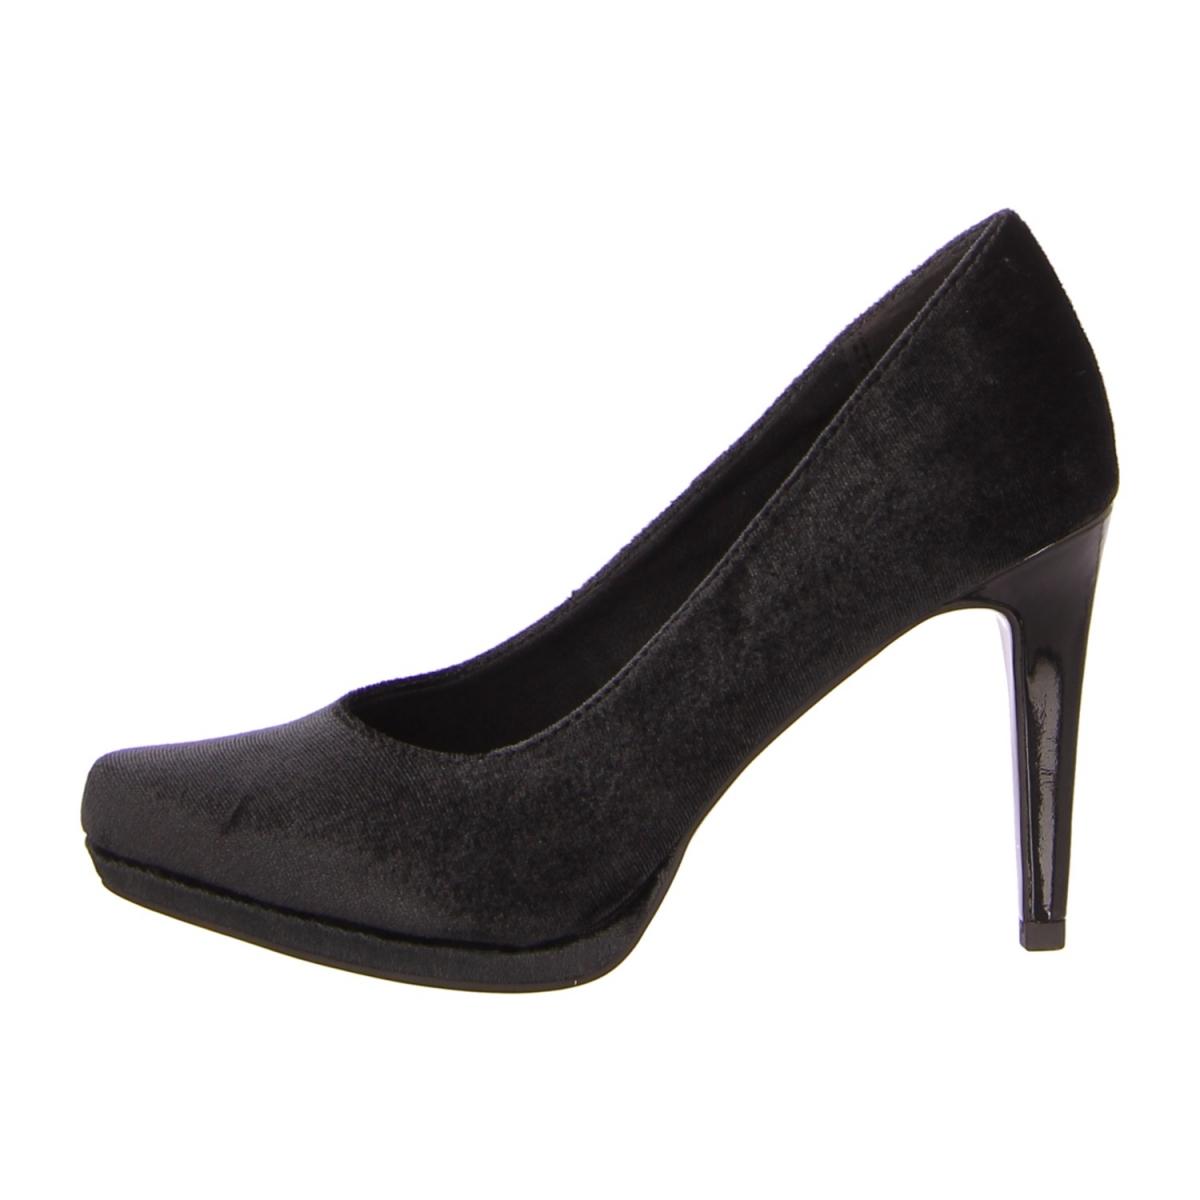 pin tamaris high heel stiefel black on pinterest. Black Bedroom Furniture Sets. Home Design Ideas